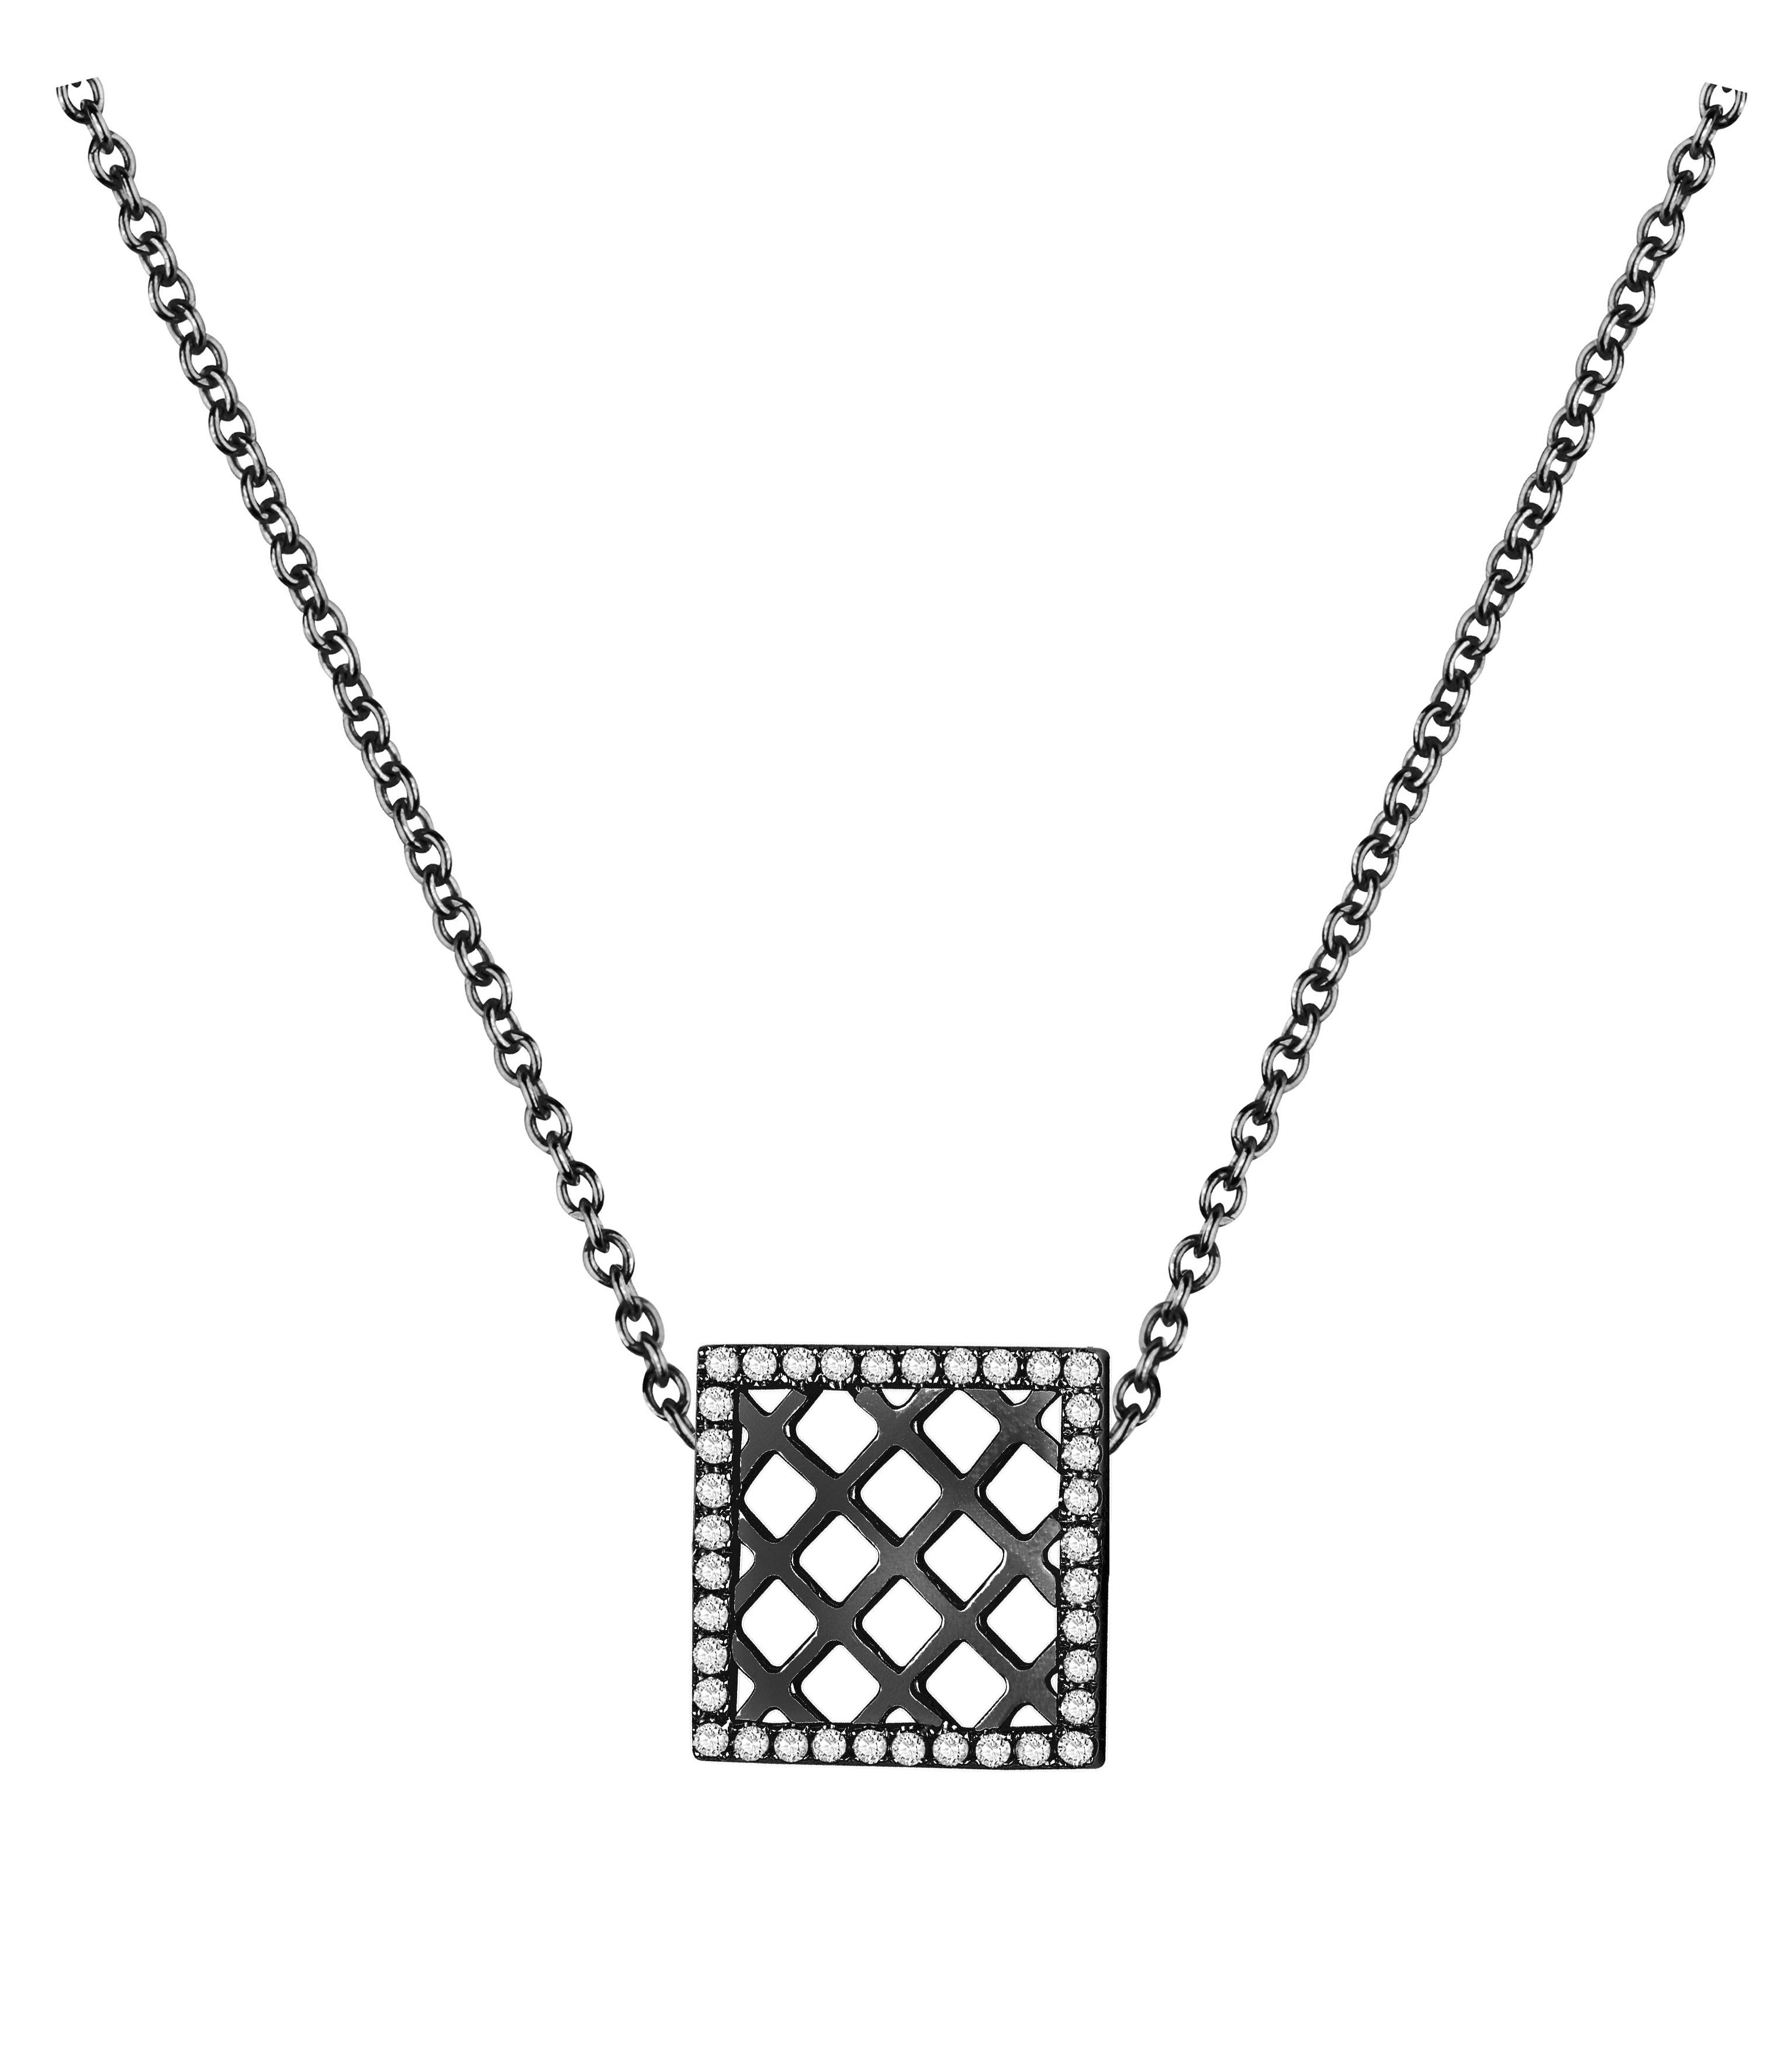 Moralité Bakwani7 Or diamants – Collier